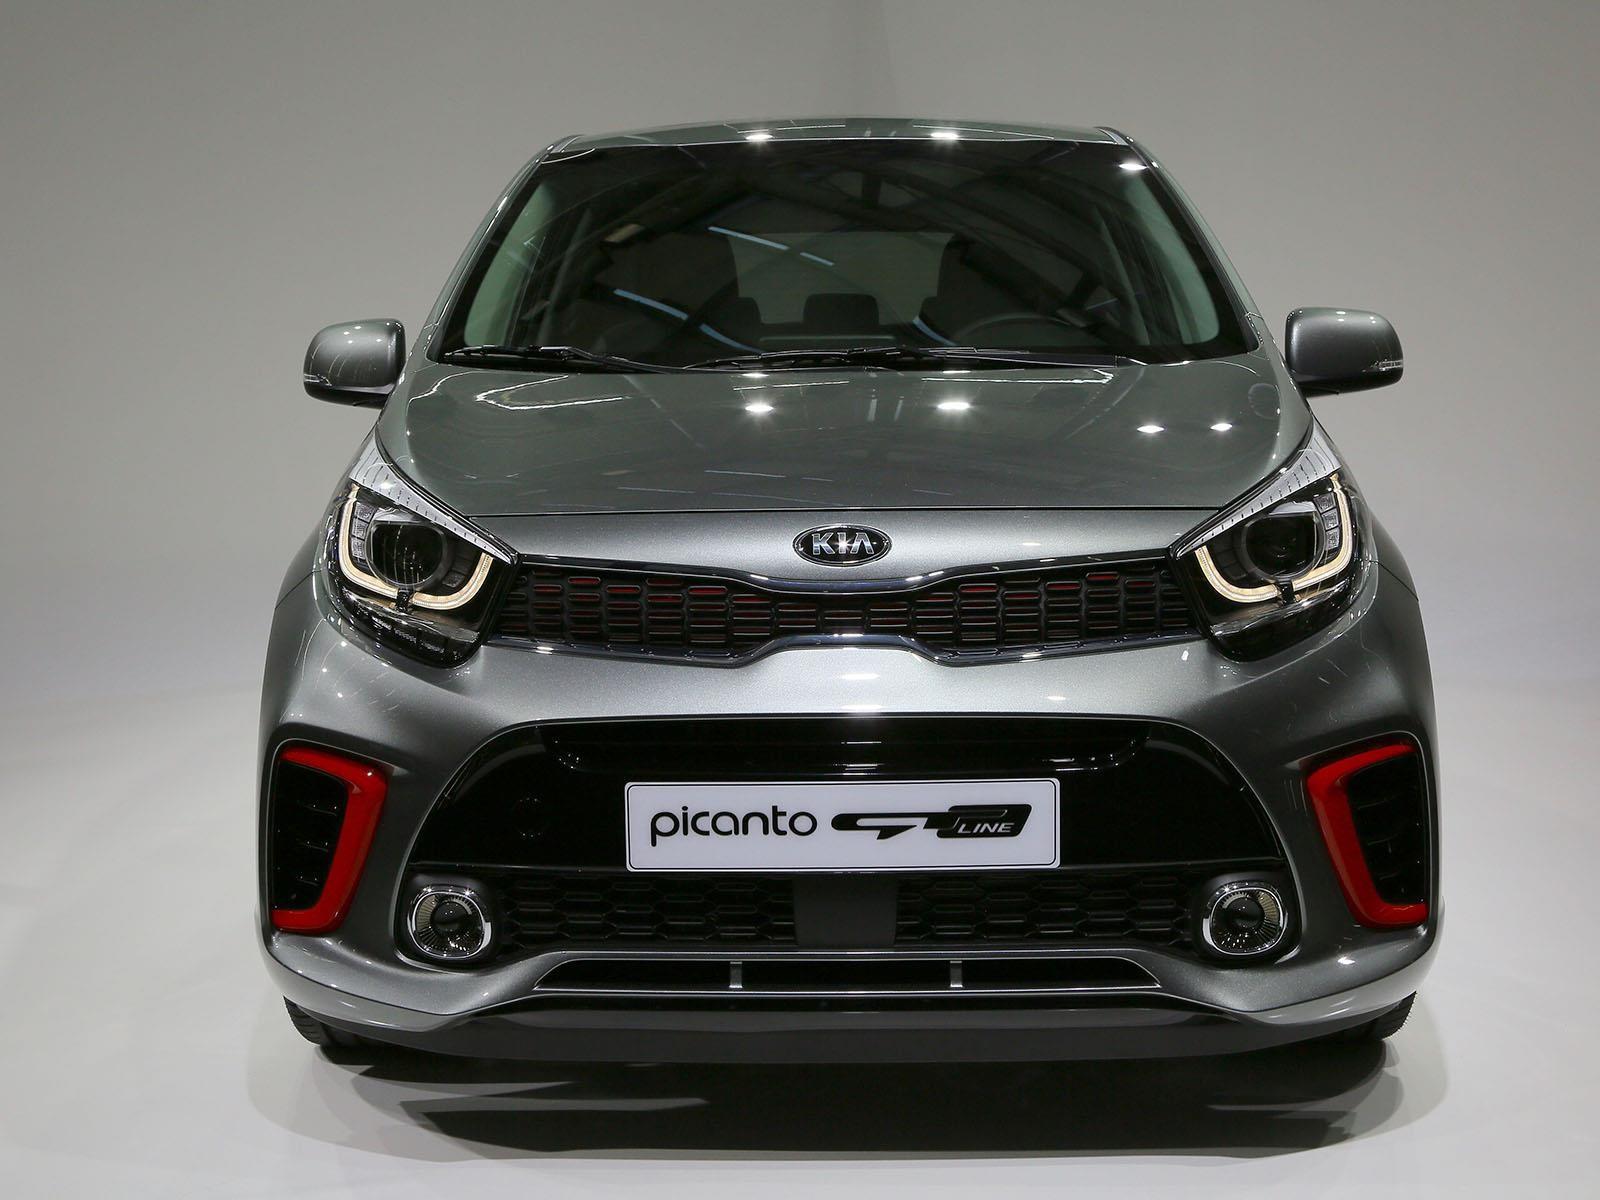 Auto Show de Ginebra 2017 - KIA Picanto 2018 - Noticias ...